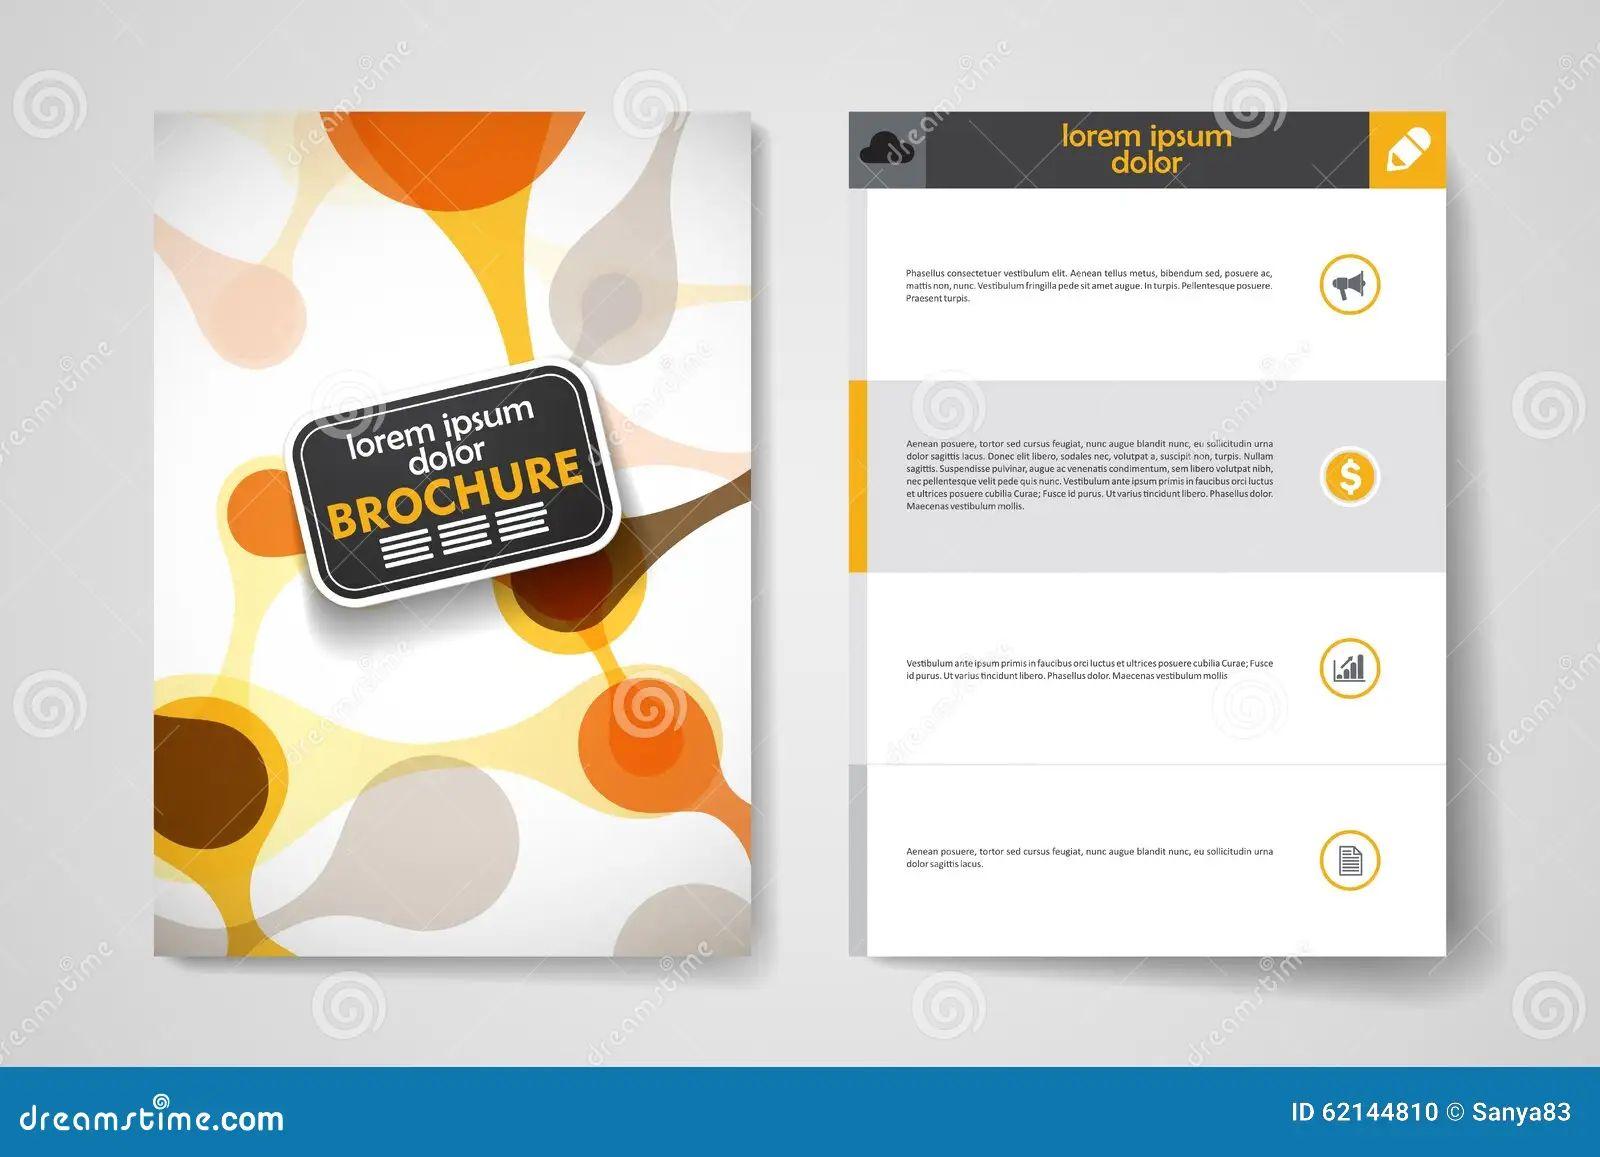 Poster design free download -  Poster Design Templates In Dna Download